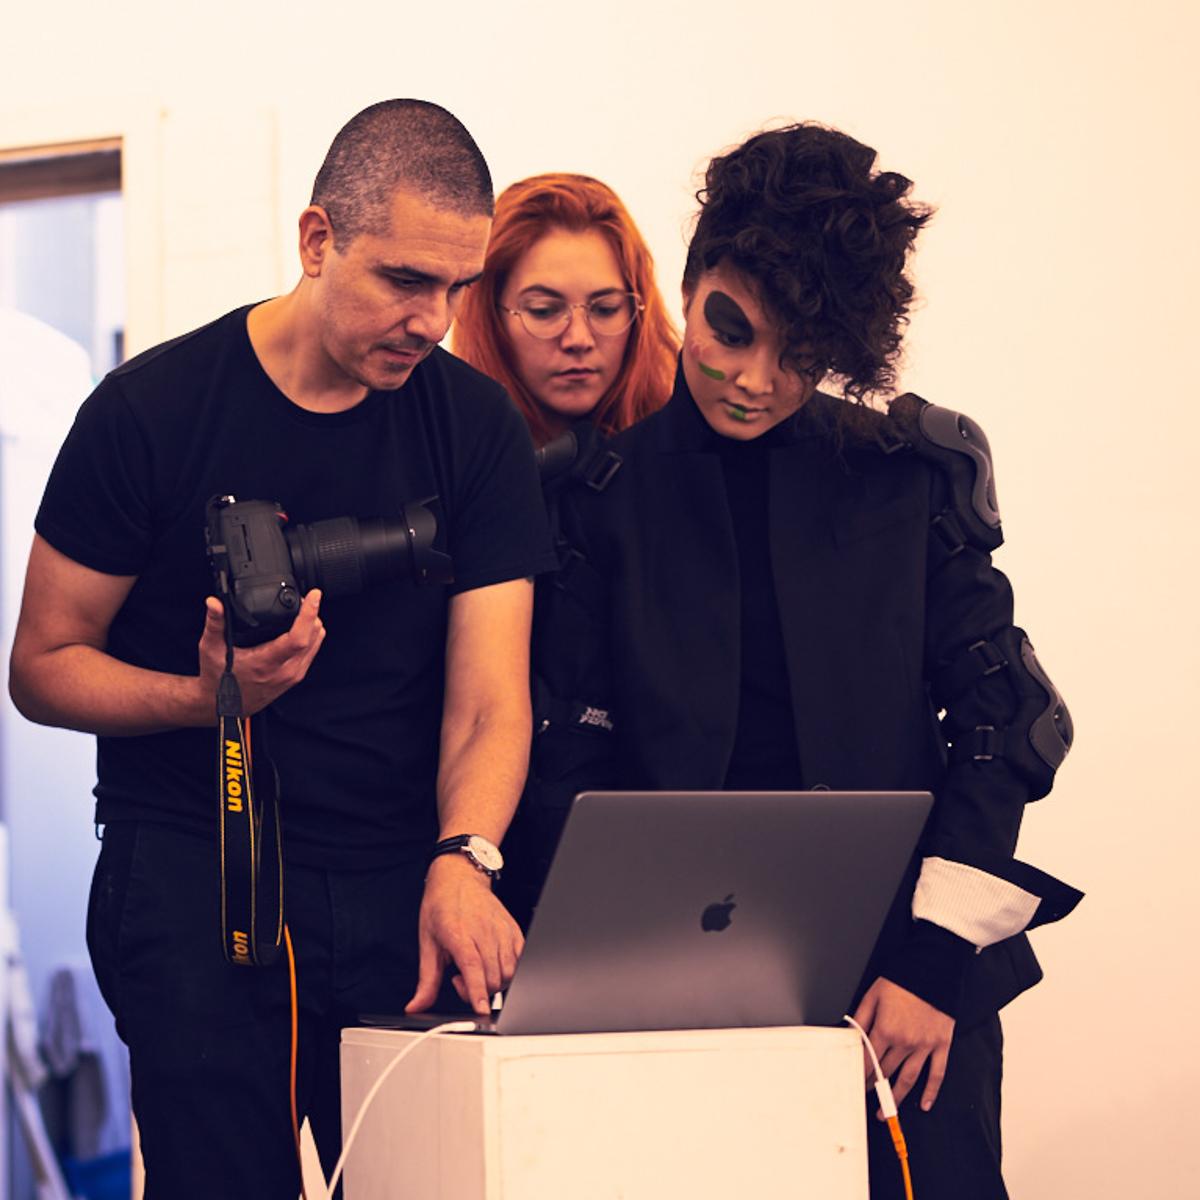 London-photographer-JC-Candanedo-Grey-Pistachio-Fashion-Corporate-Portraits-Headshots-Blog-Creative-Industry-London-life-coach-work-in-progress.jpg